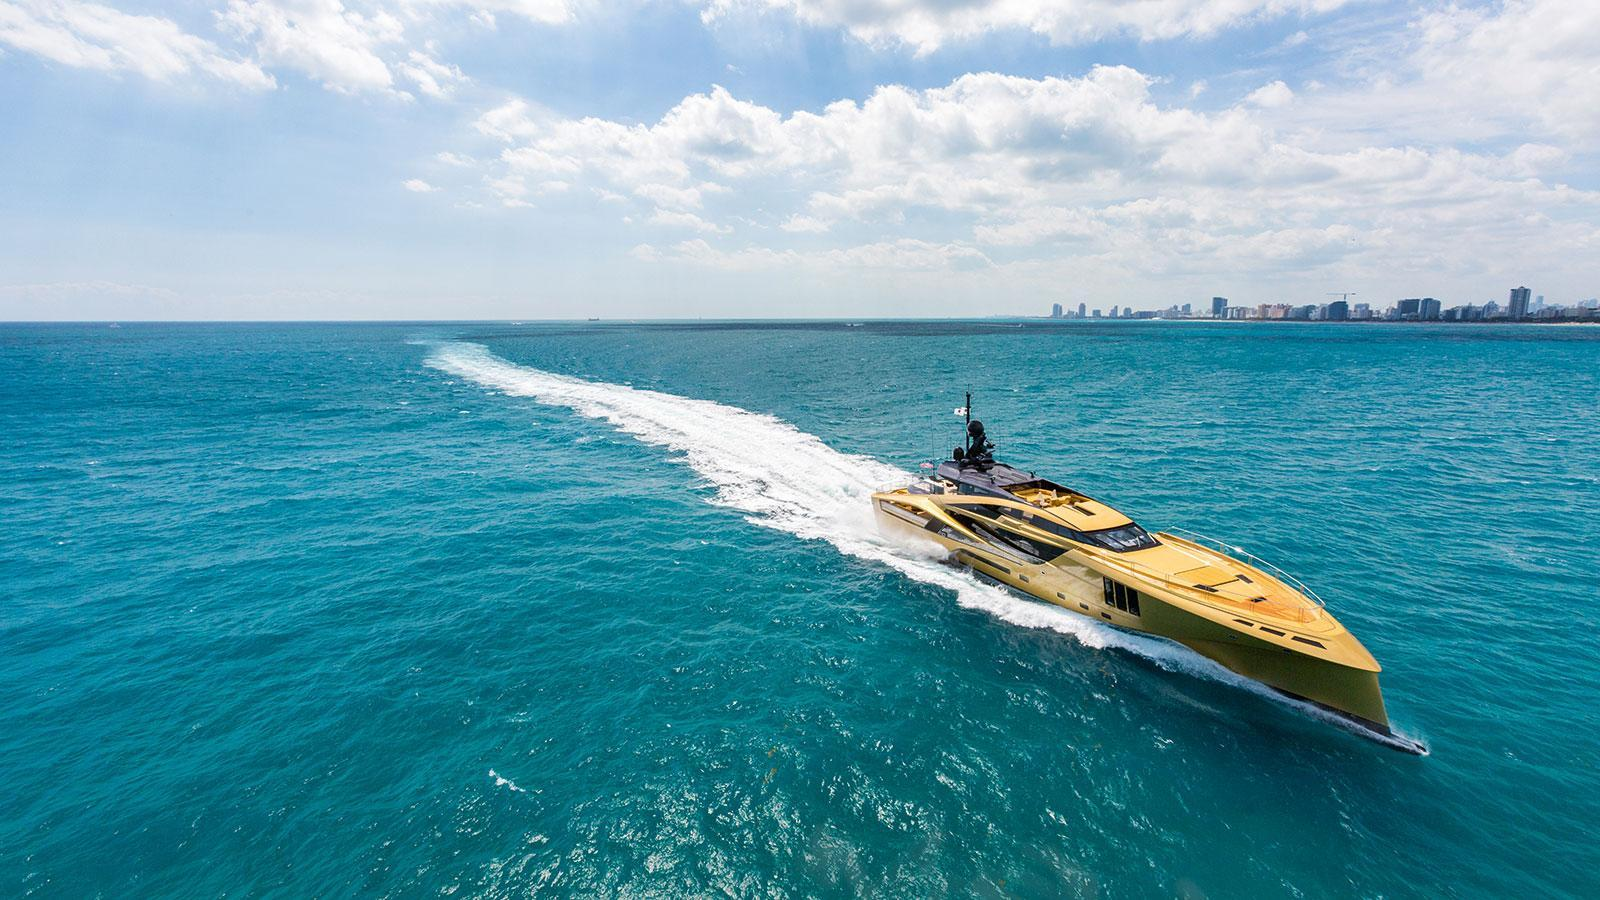 khaliha-motor-yacht-palmer-johnson-super-sport-48-2014-49m-cruising